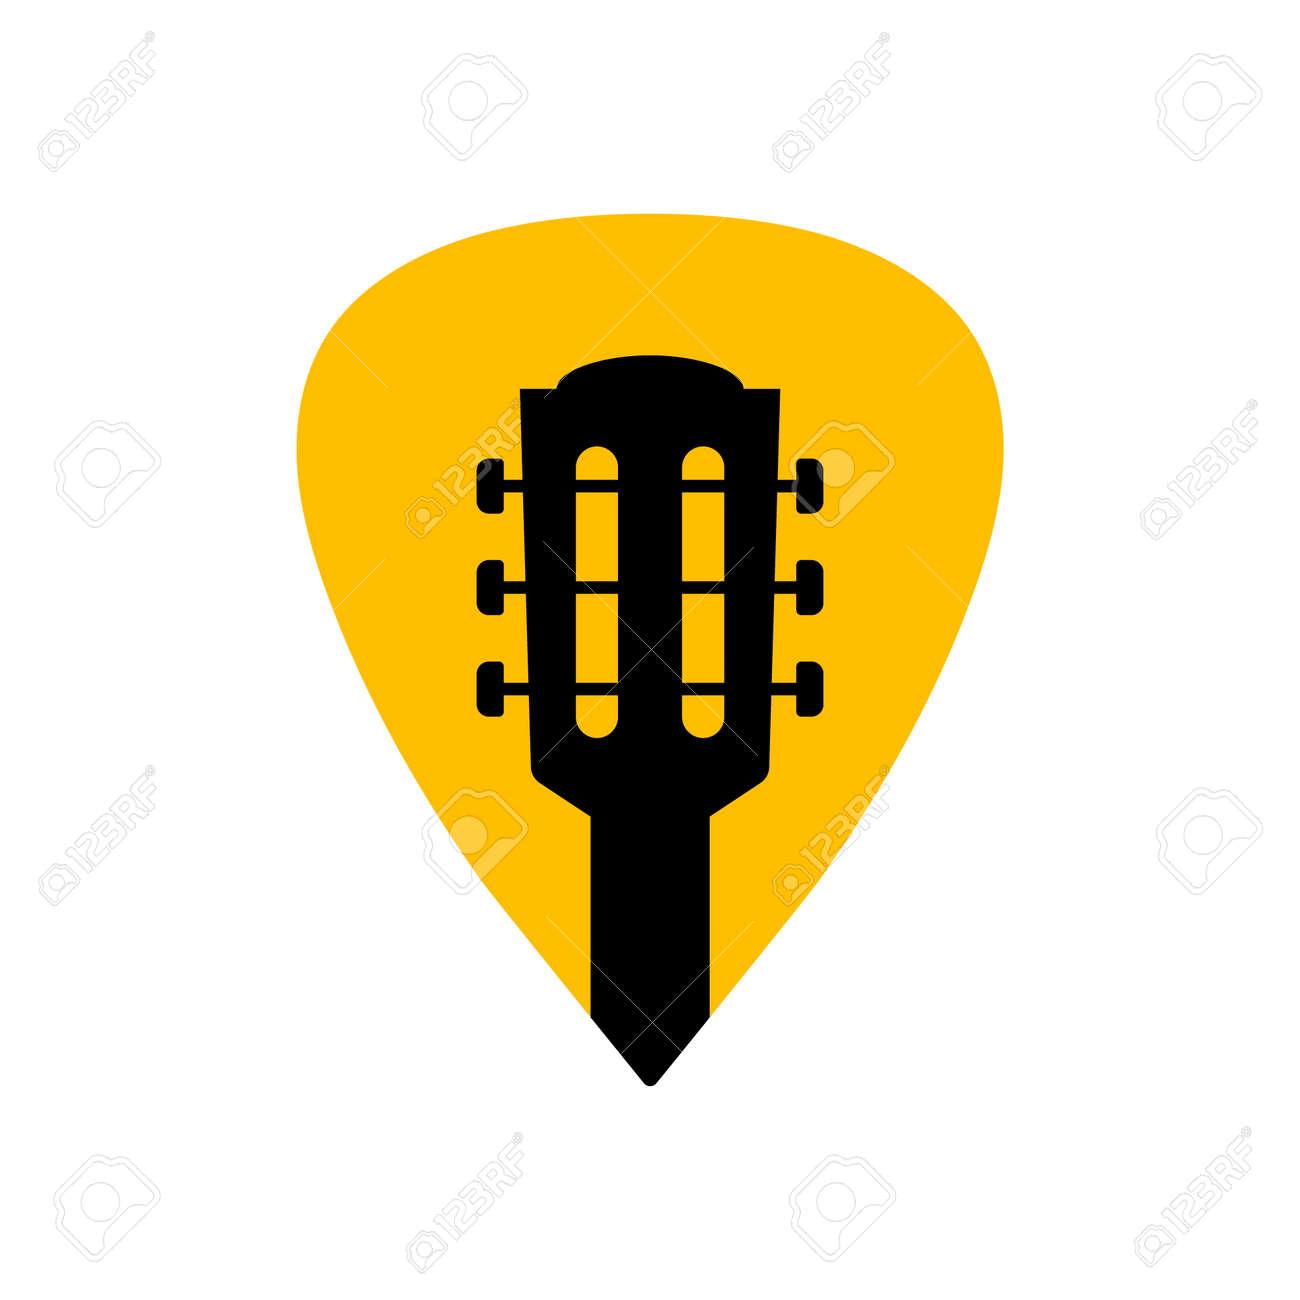 Guitar acoustick pick vector design icon flat logo. Mediator guiatar music symbol headstock - 168952813